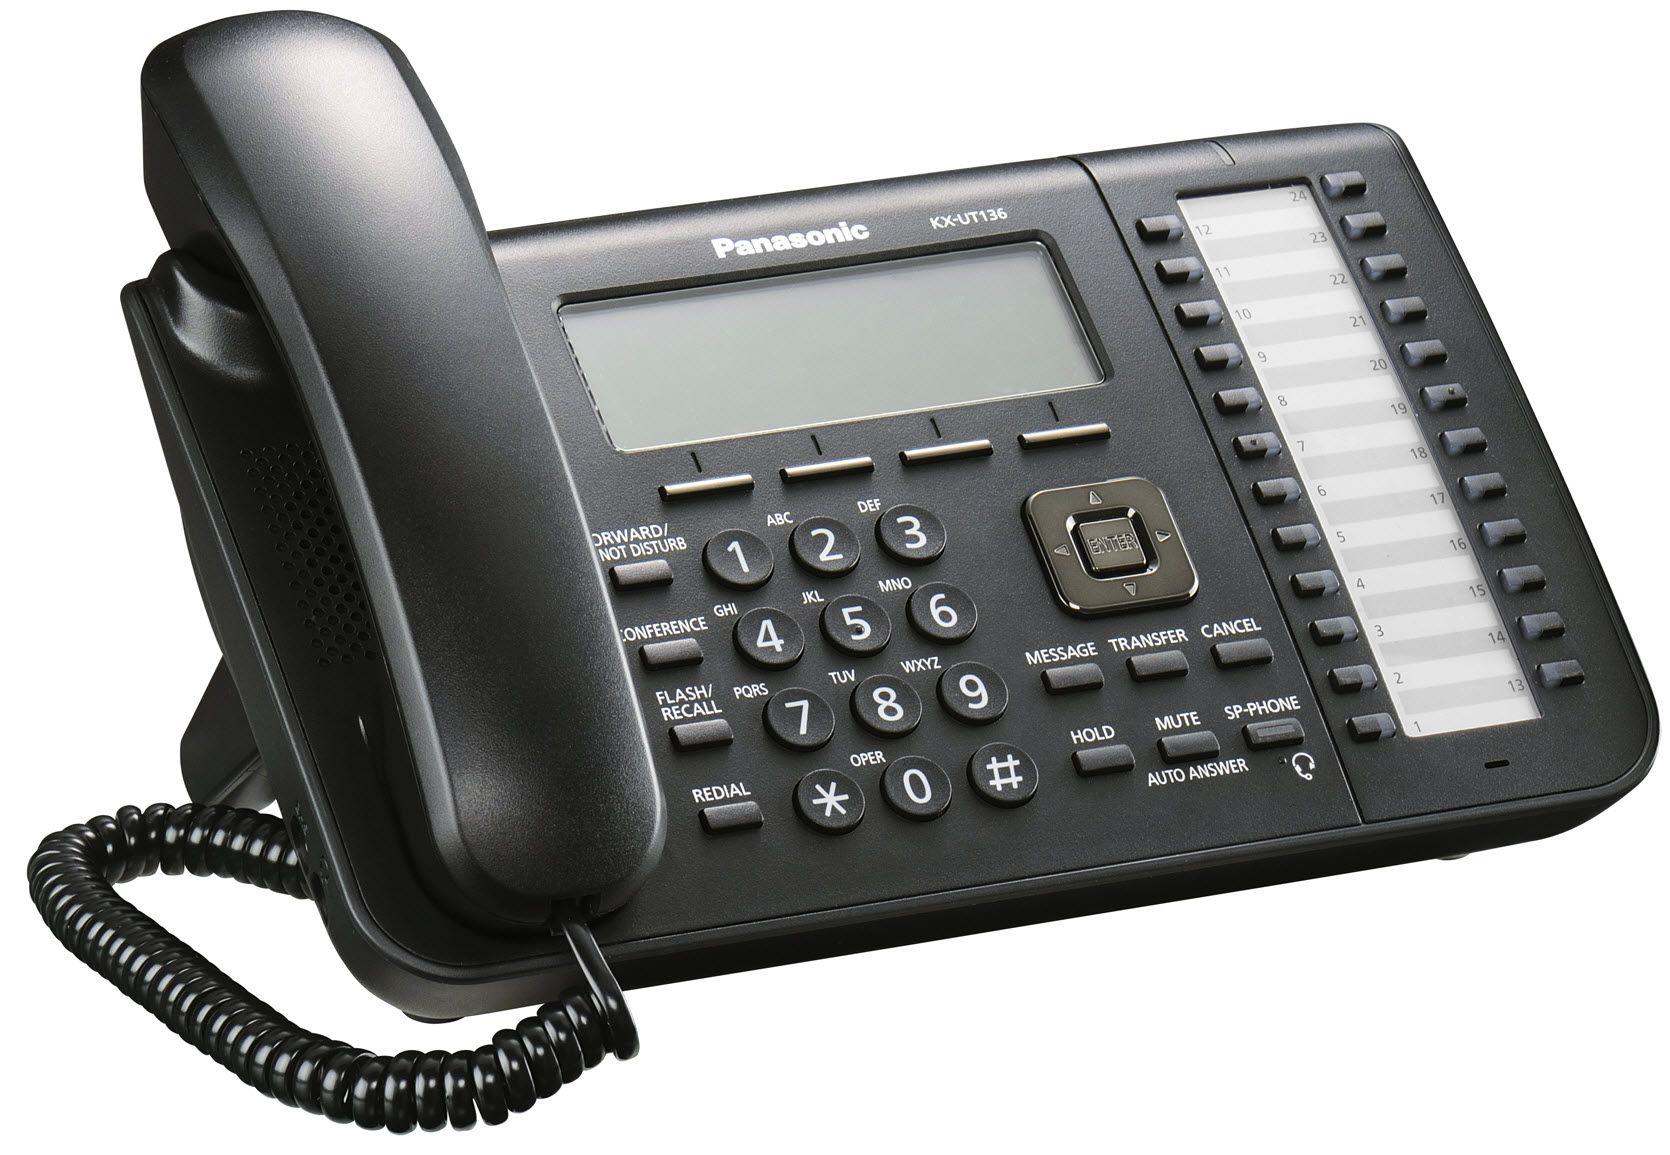 Panasonic Kx Ut136b Review Businessfibernetics